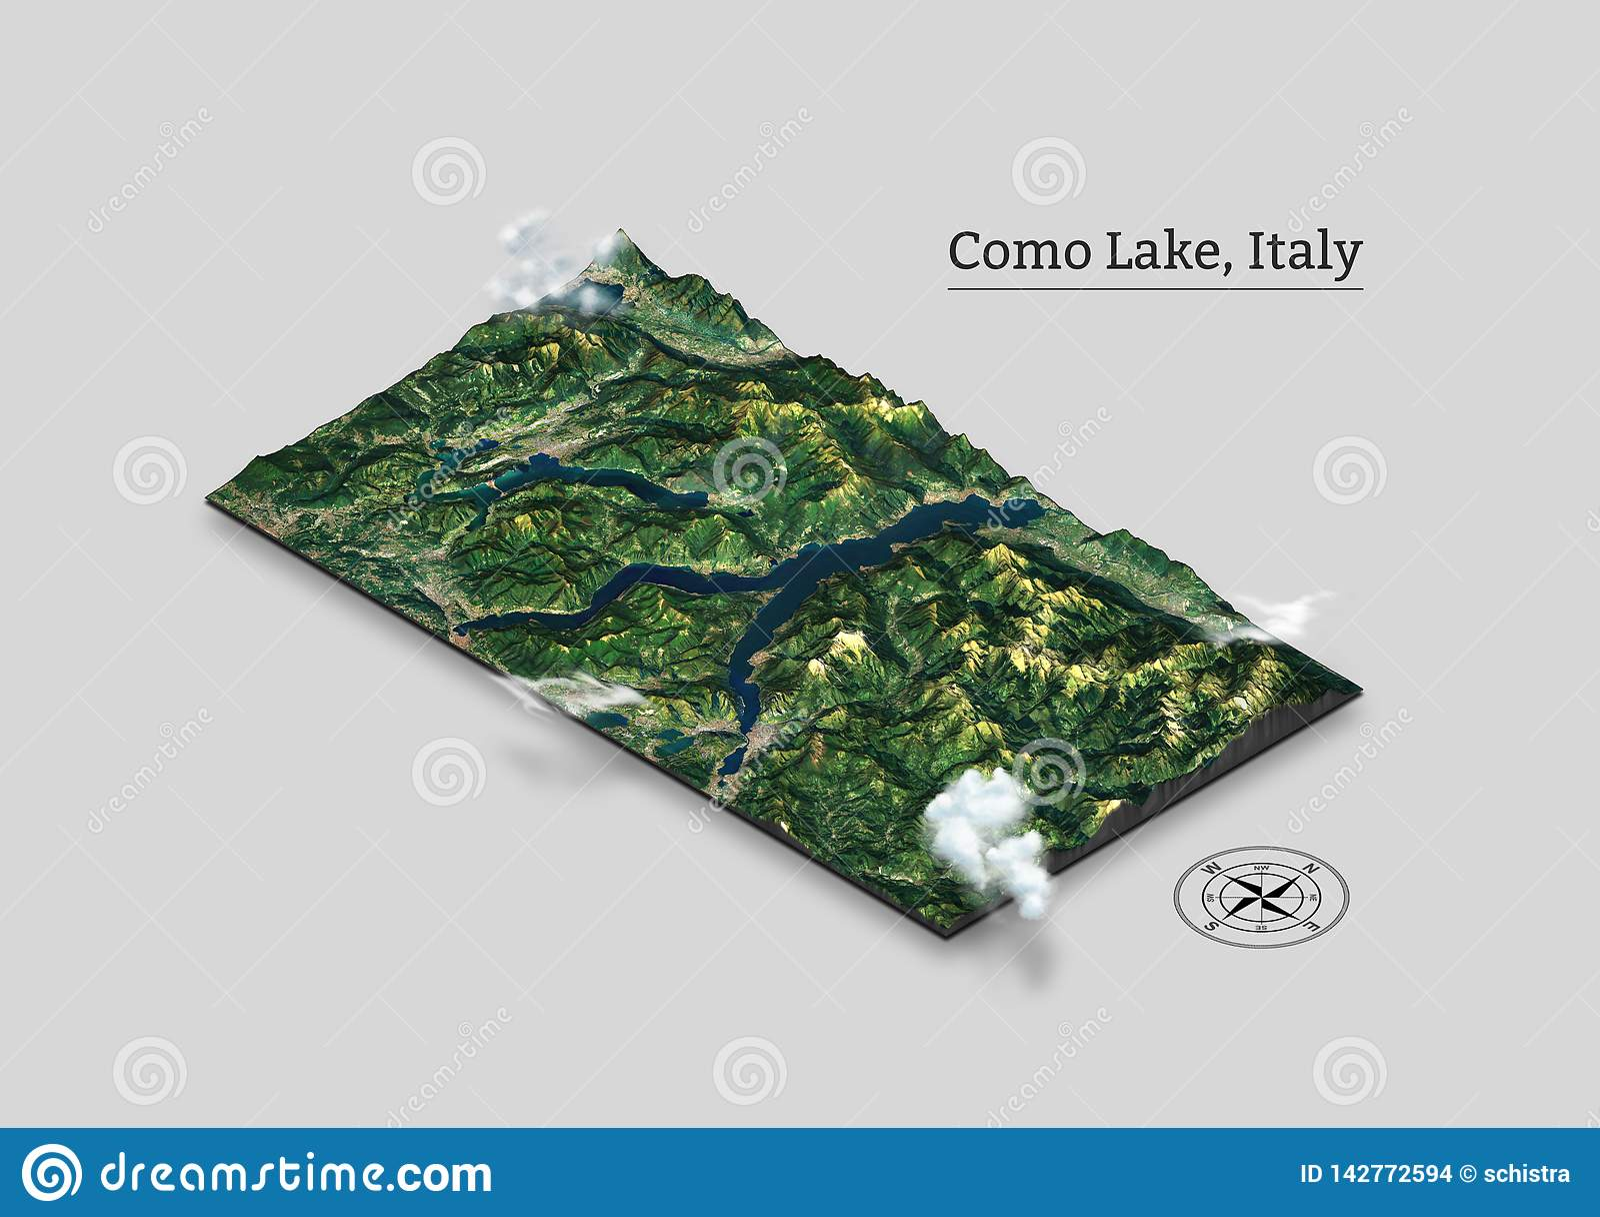 Como Lake isometric map, Italy